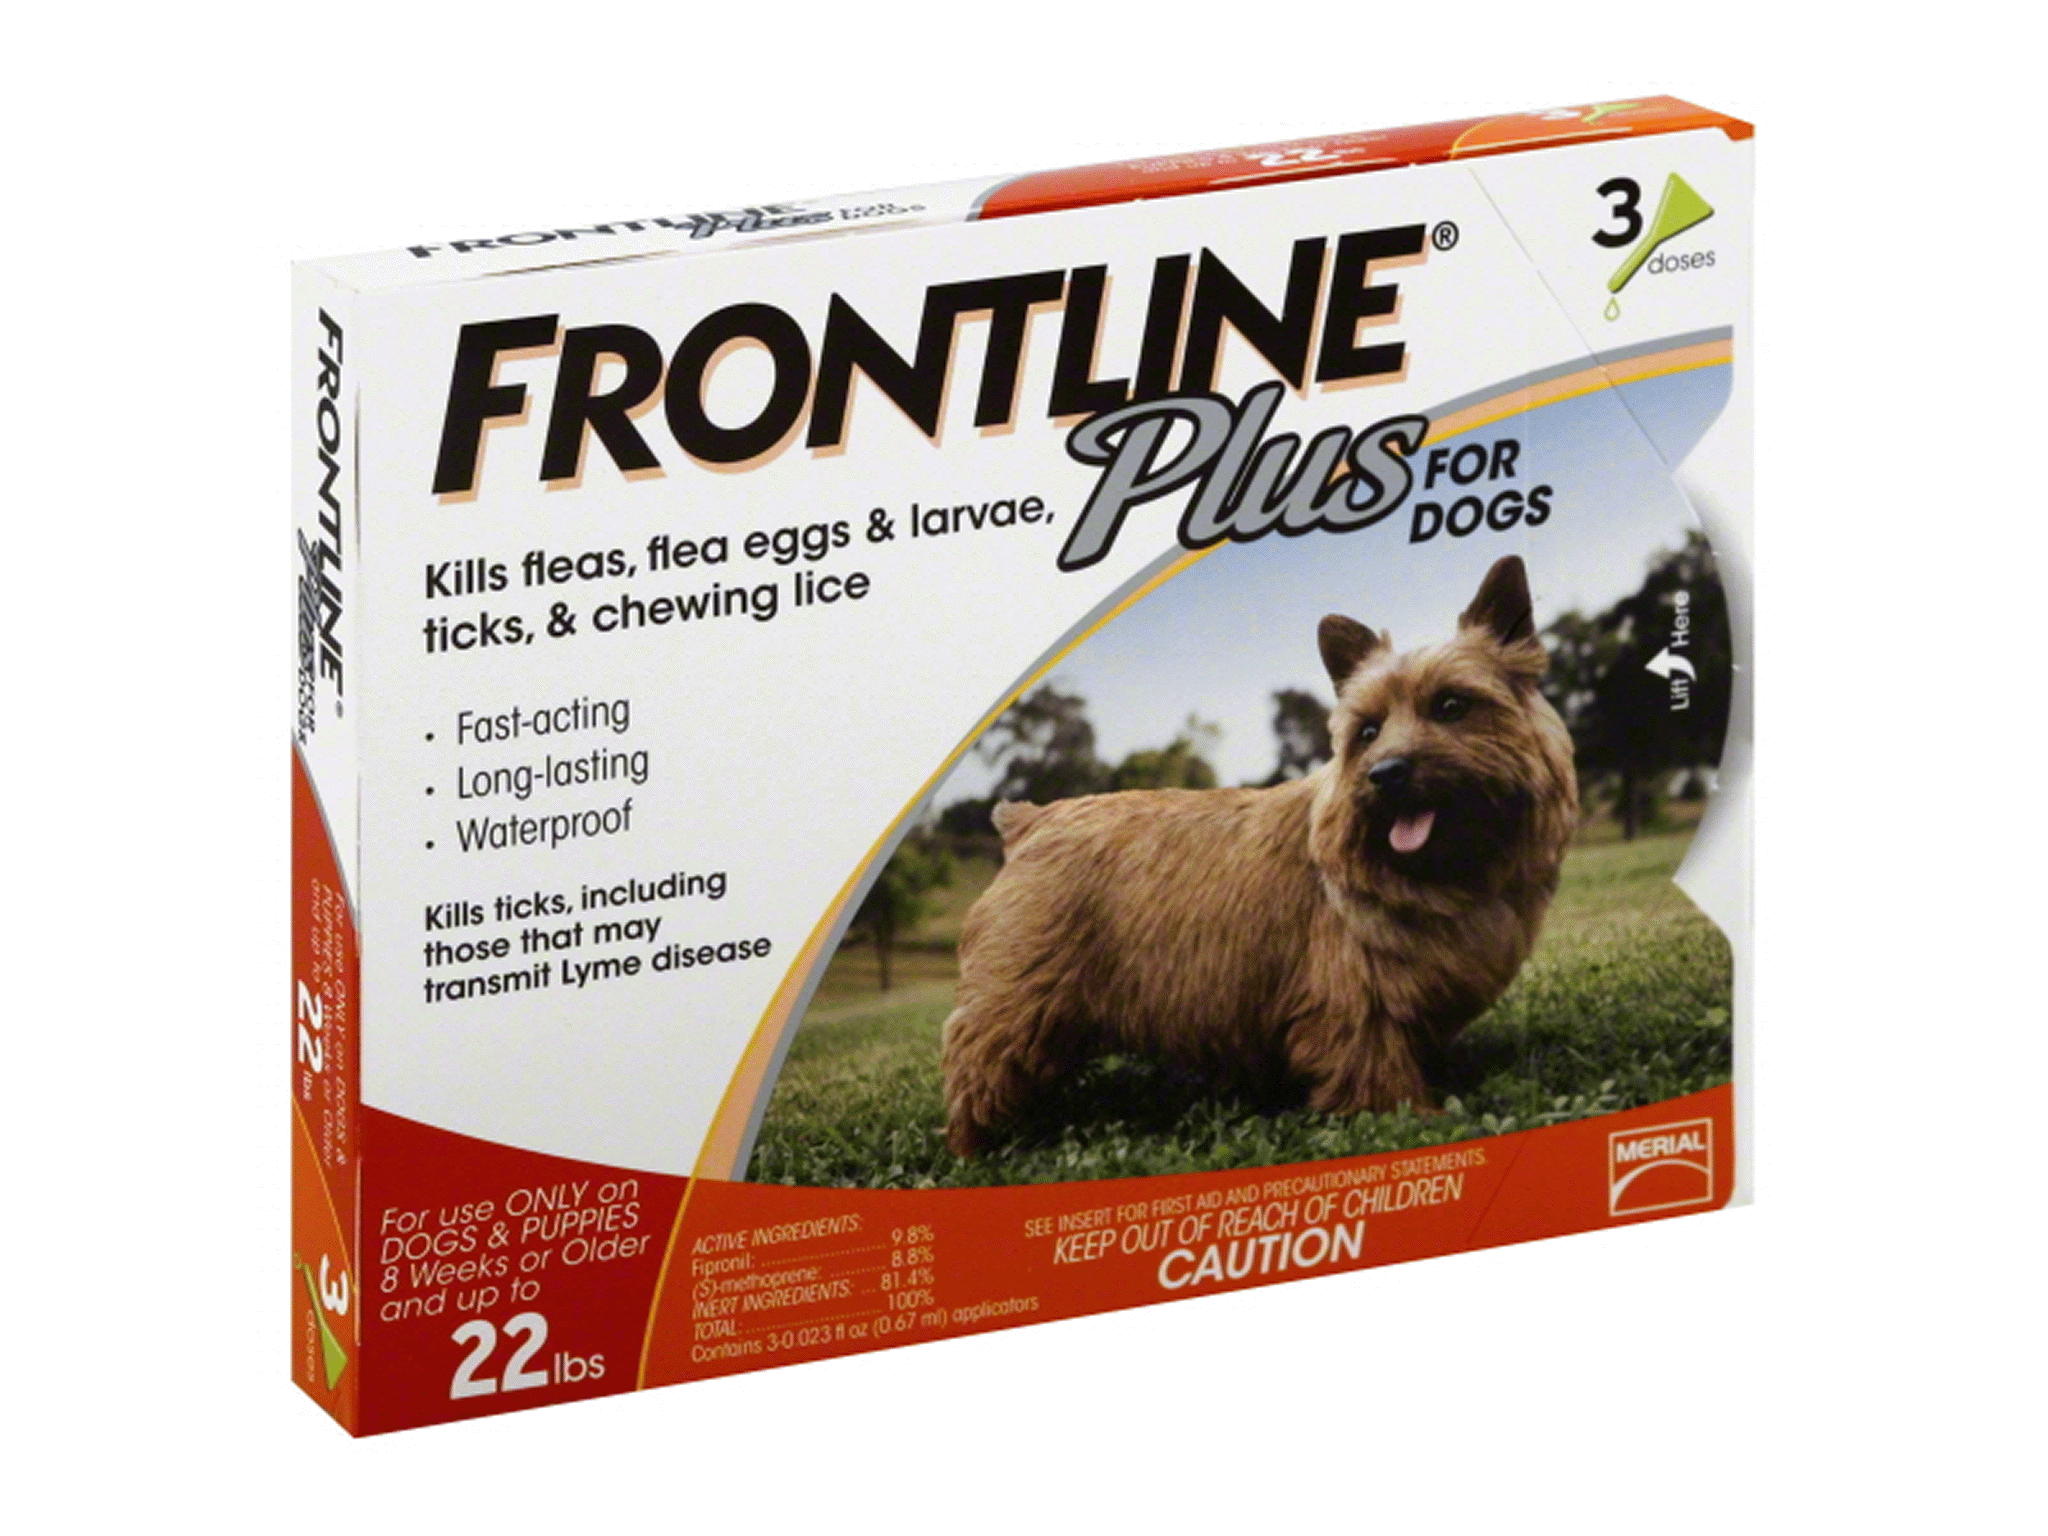 Frontline Plus Flea & Tick for Dogs 5-22 lbs 3 pk | Meijer.com